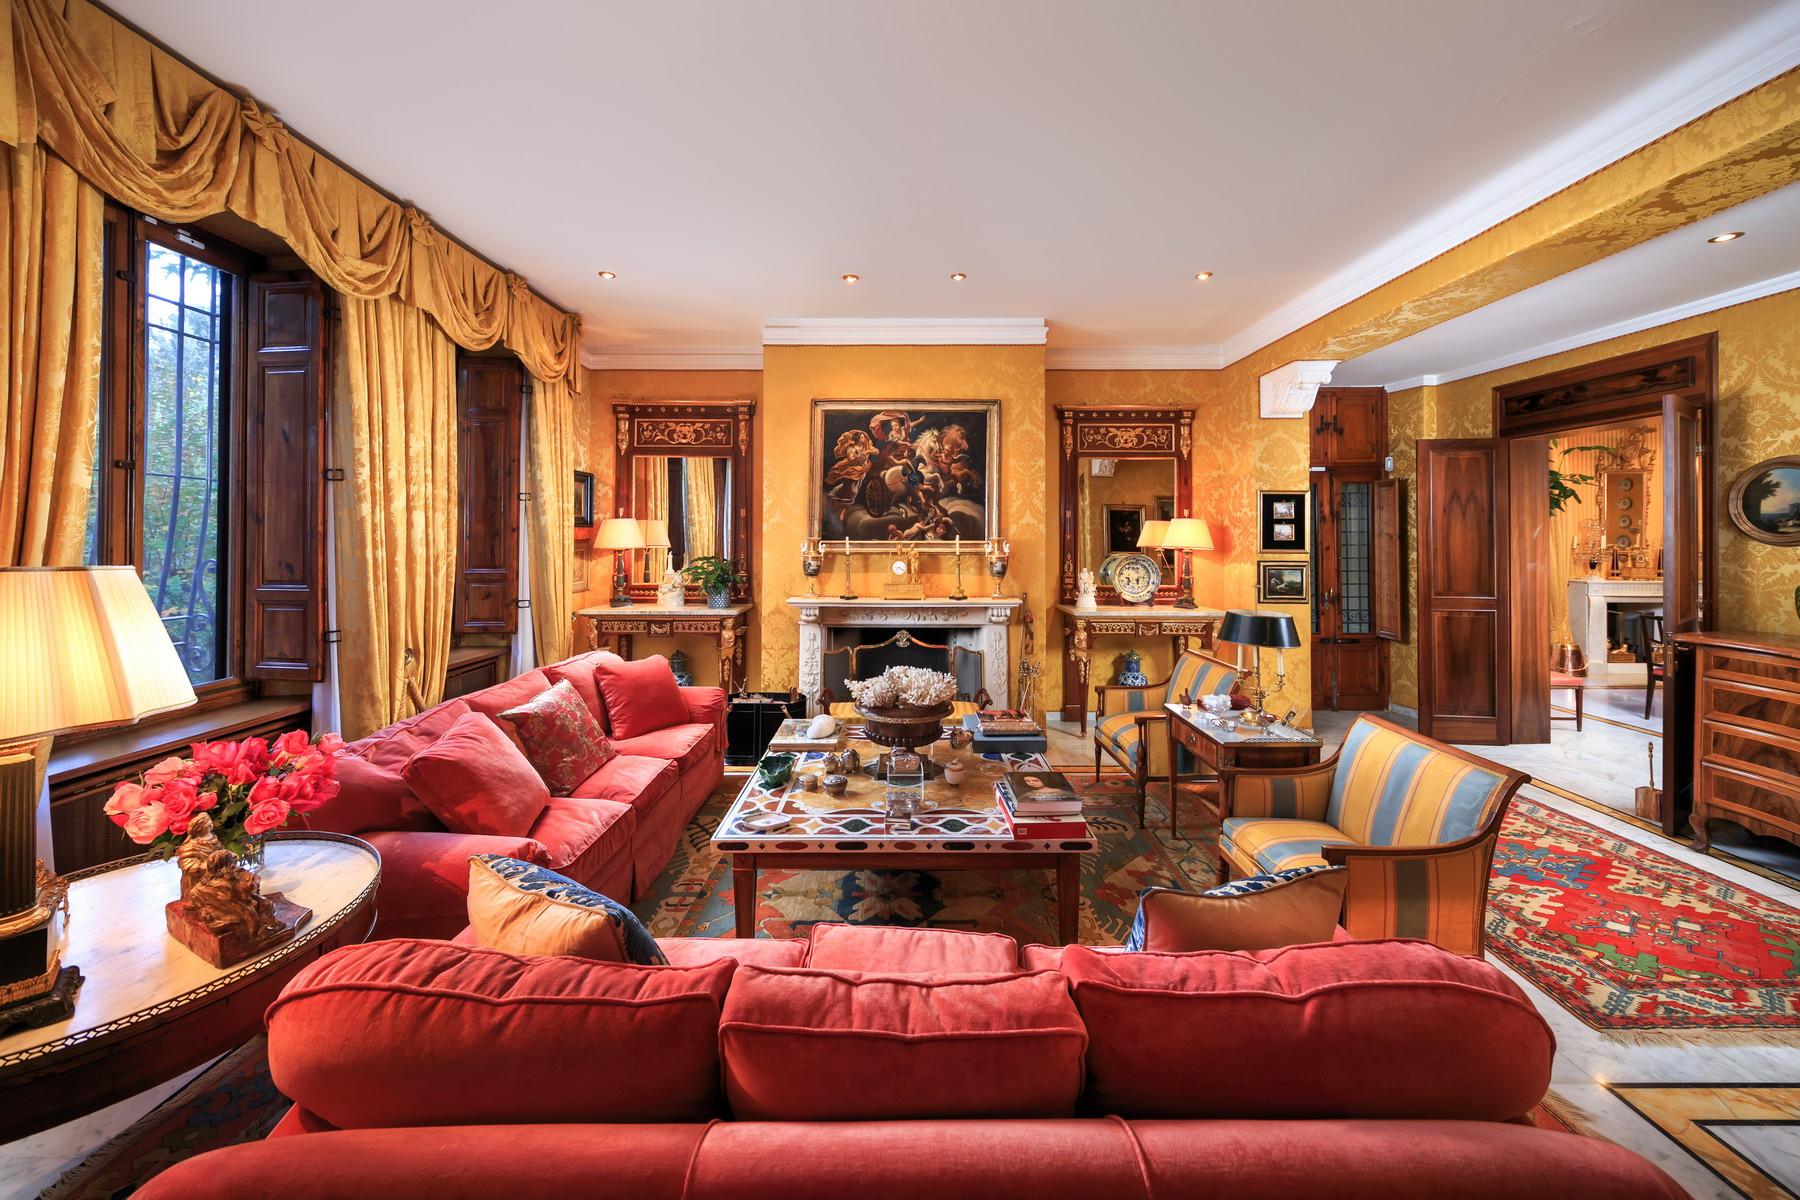 Villa in Vendita a Lucca: 5 locali, 900 mq - Foto 22